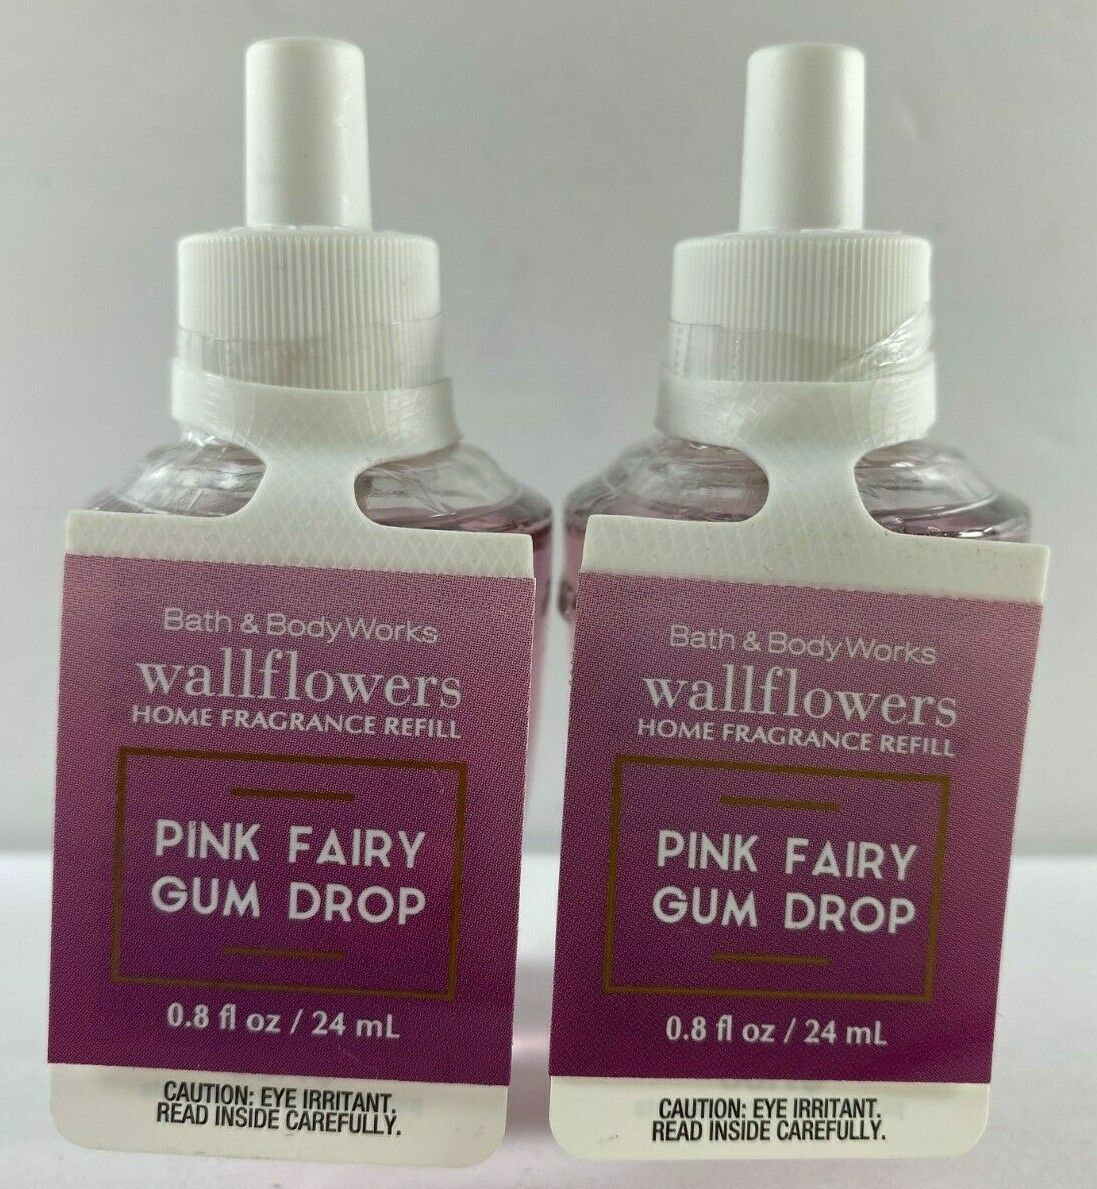 Lot of 2 Bath Body Works Wallflowers Refill .8 fl oz ea PINK FAIRY GUM DROP - $19.79